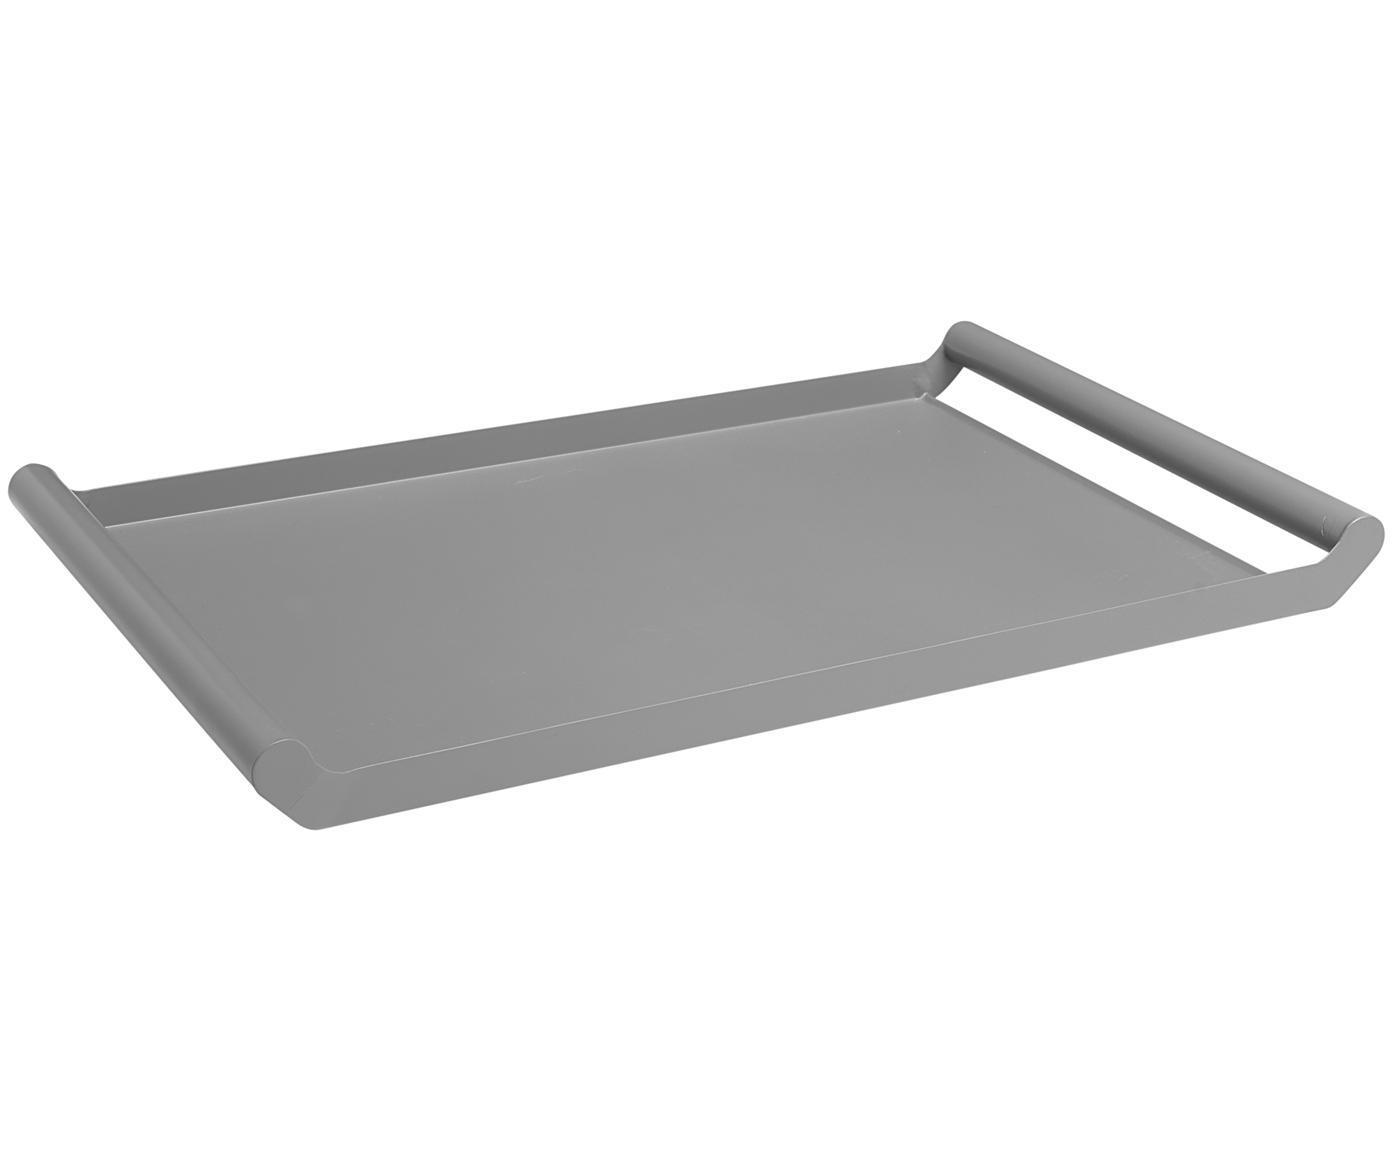 Serviertablett Charlie in Grau, Metall, beschichtet, Grau, B 50 x T 30 cm